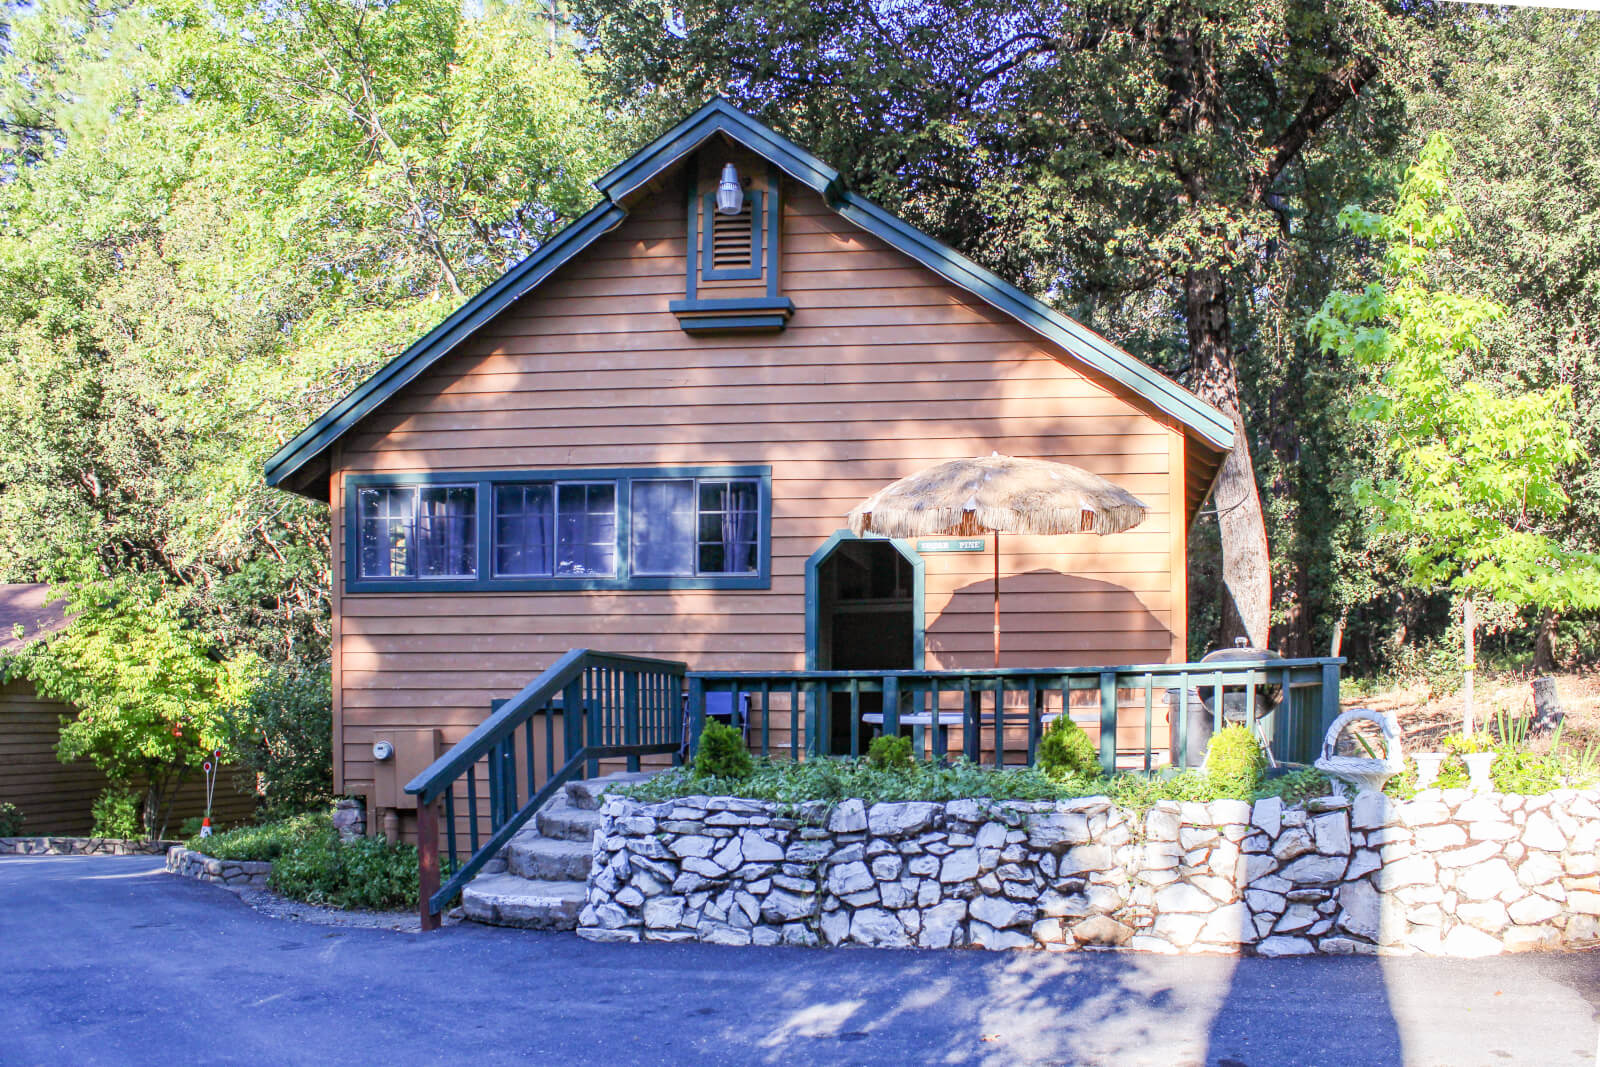 Lazy Z Resort Cabin getaway in Twain Harte California